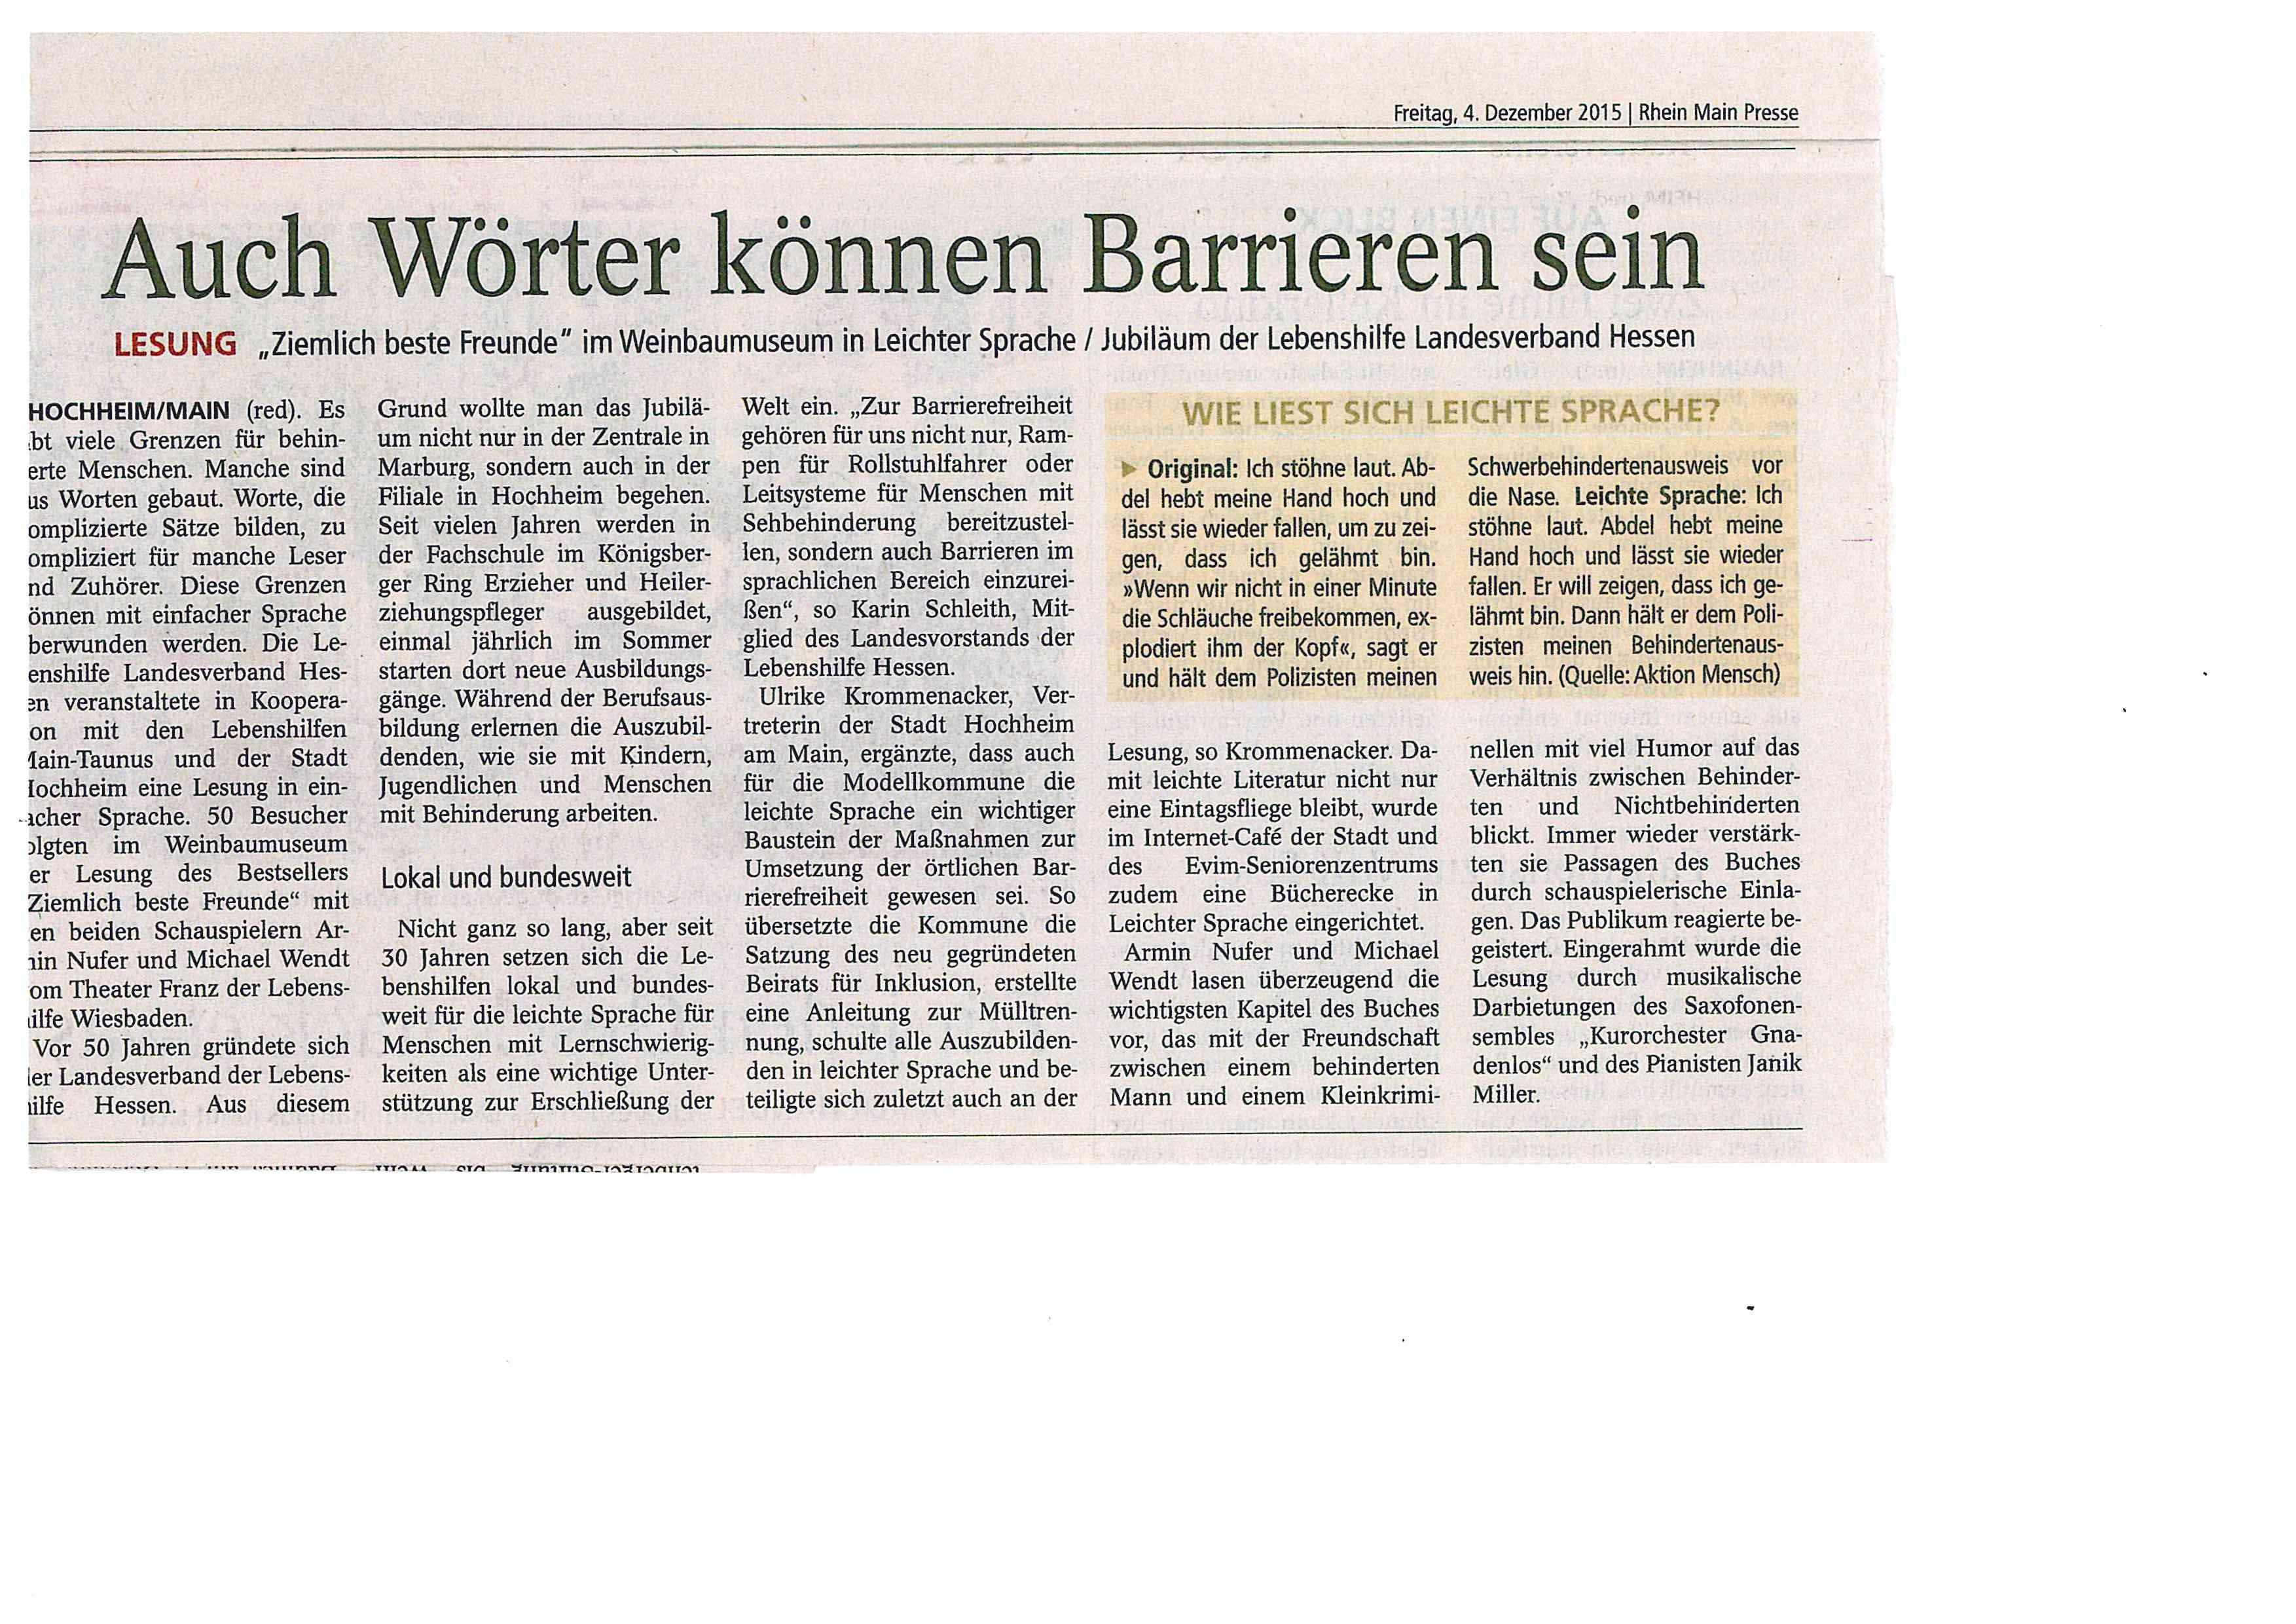 Lesung 29.11.15 - Zieml.beste Freunde Presseartikel o. Foto